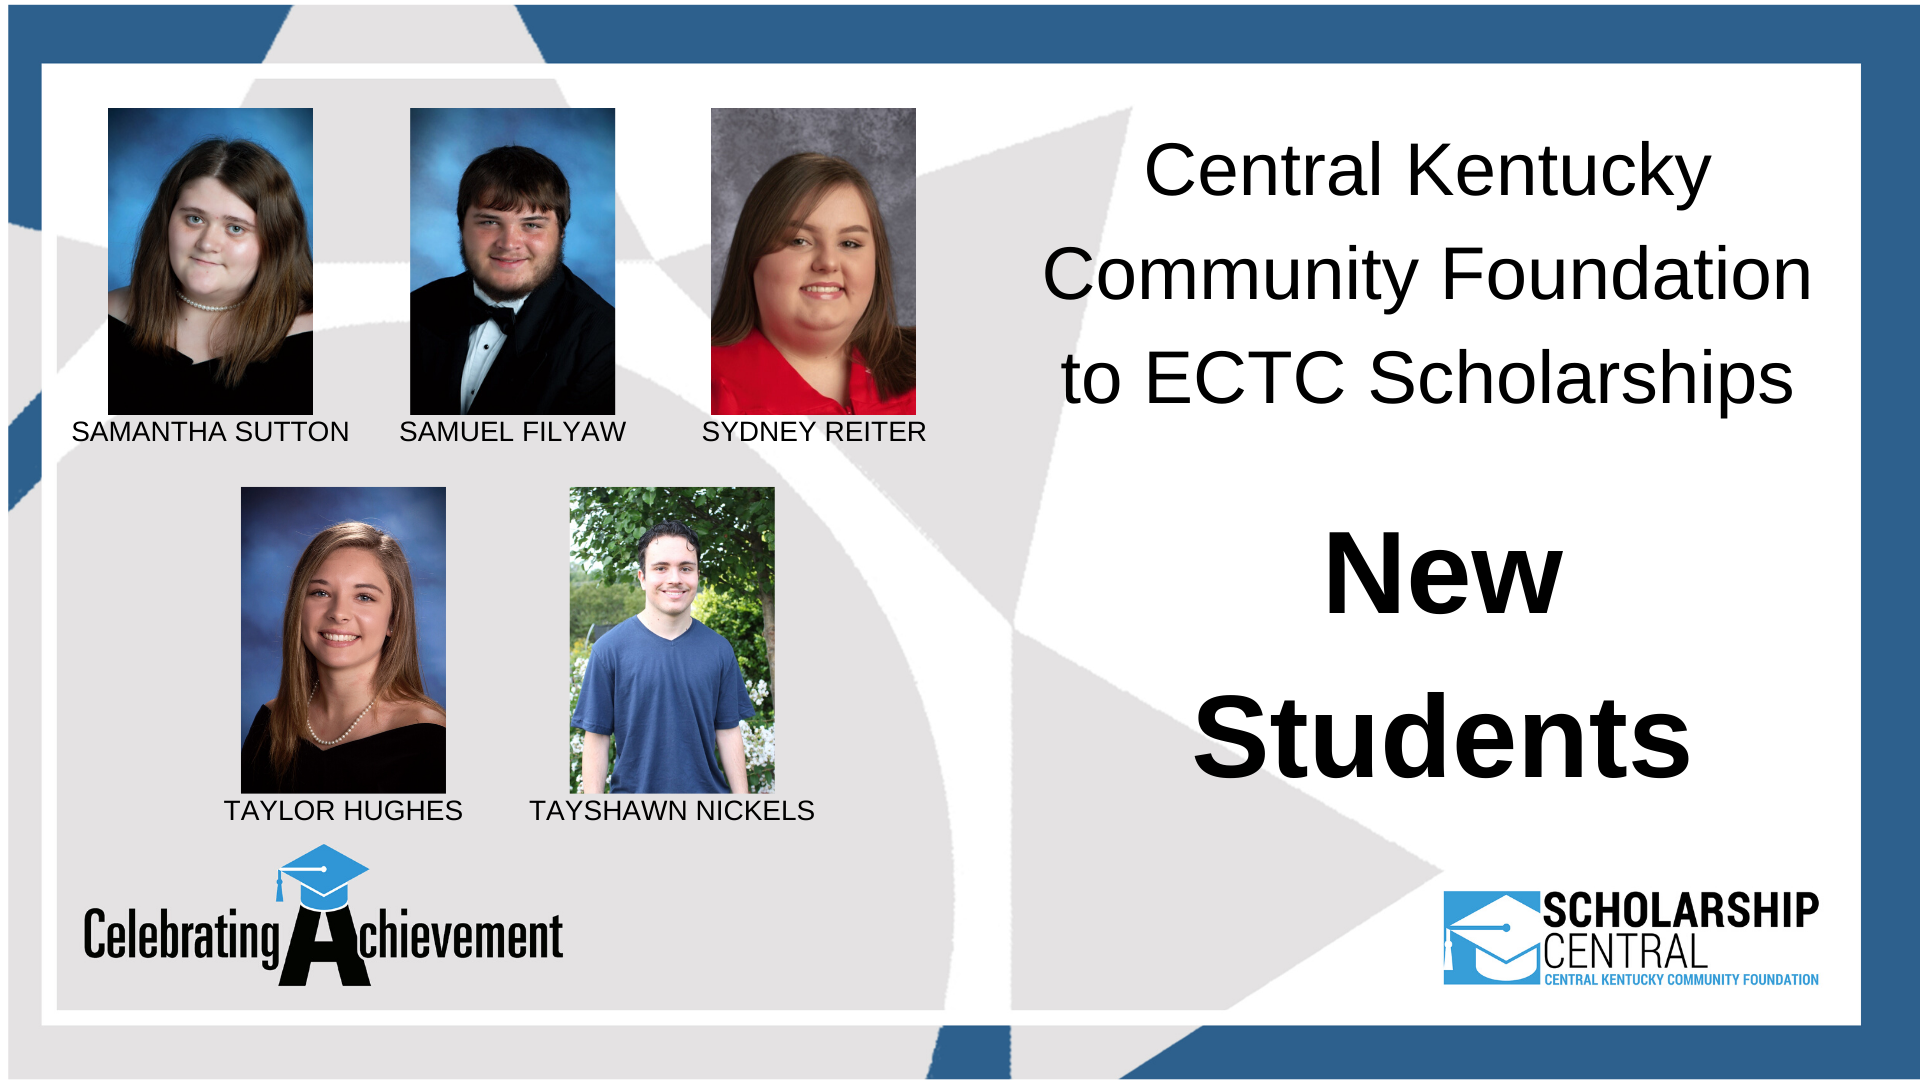 ECTC New Scholarship5